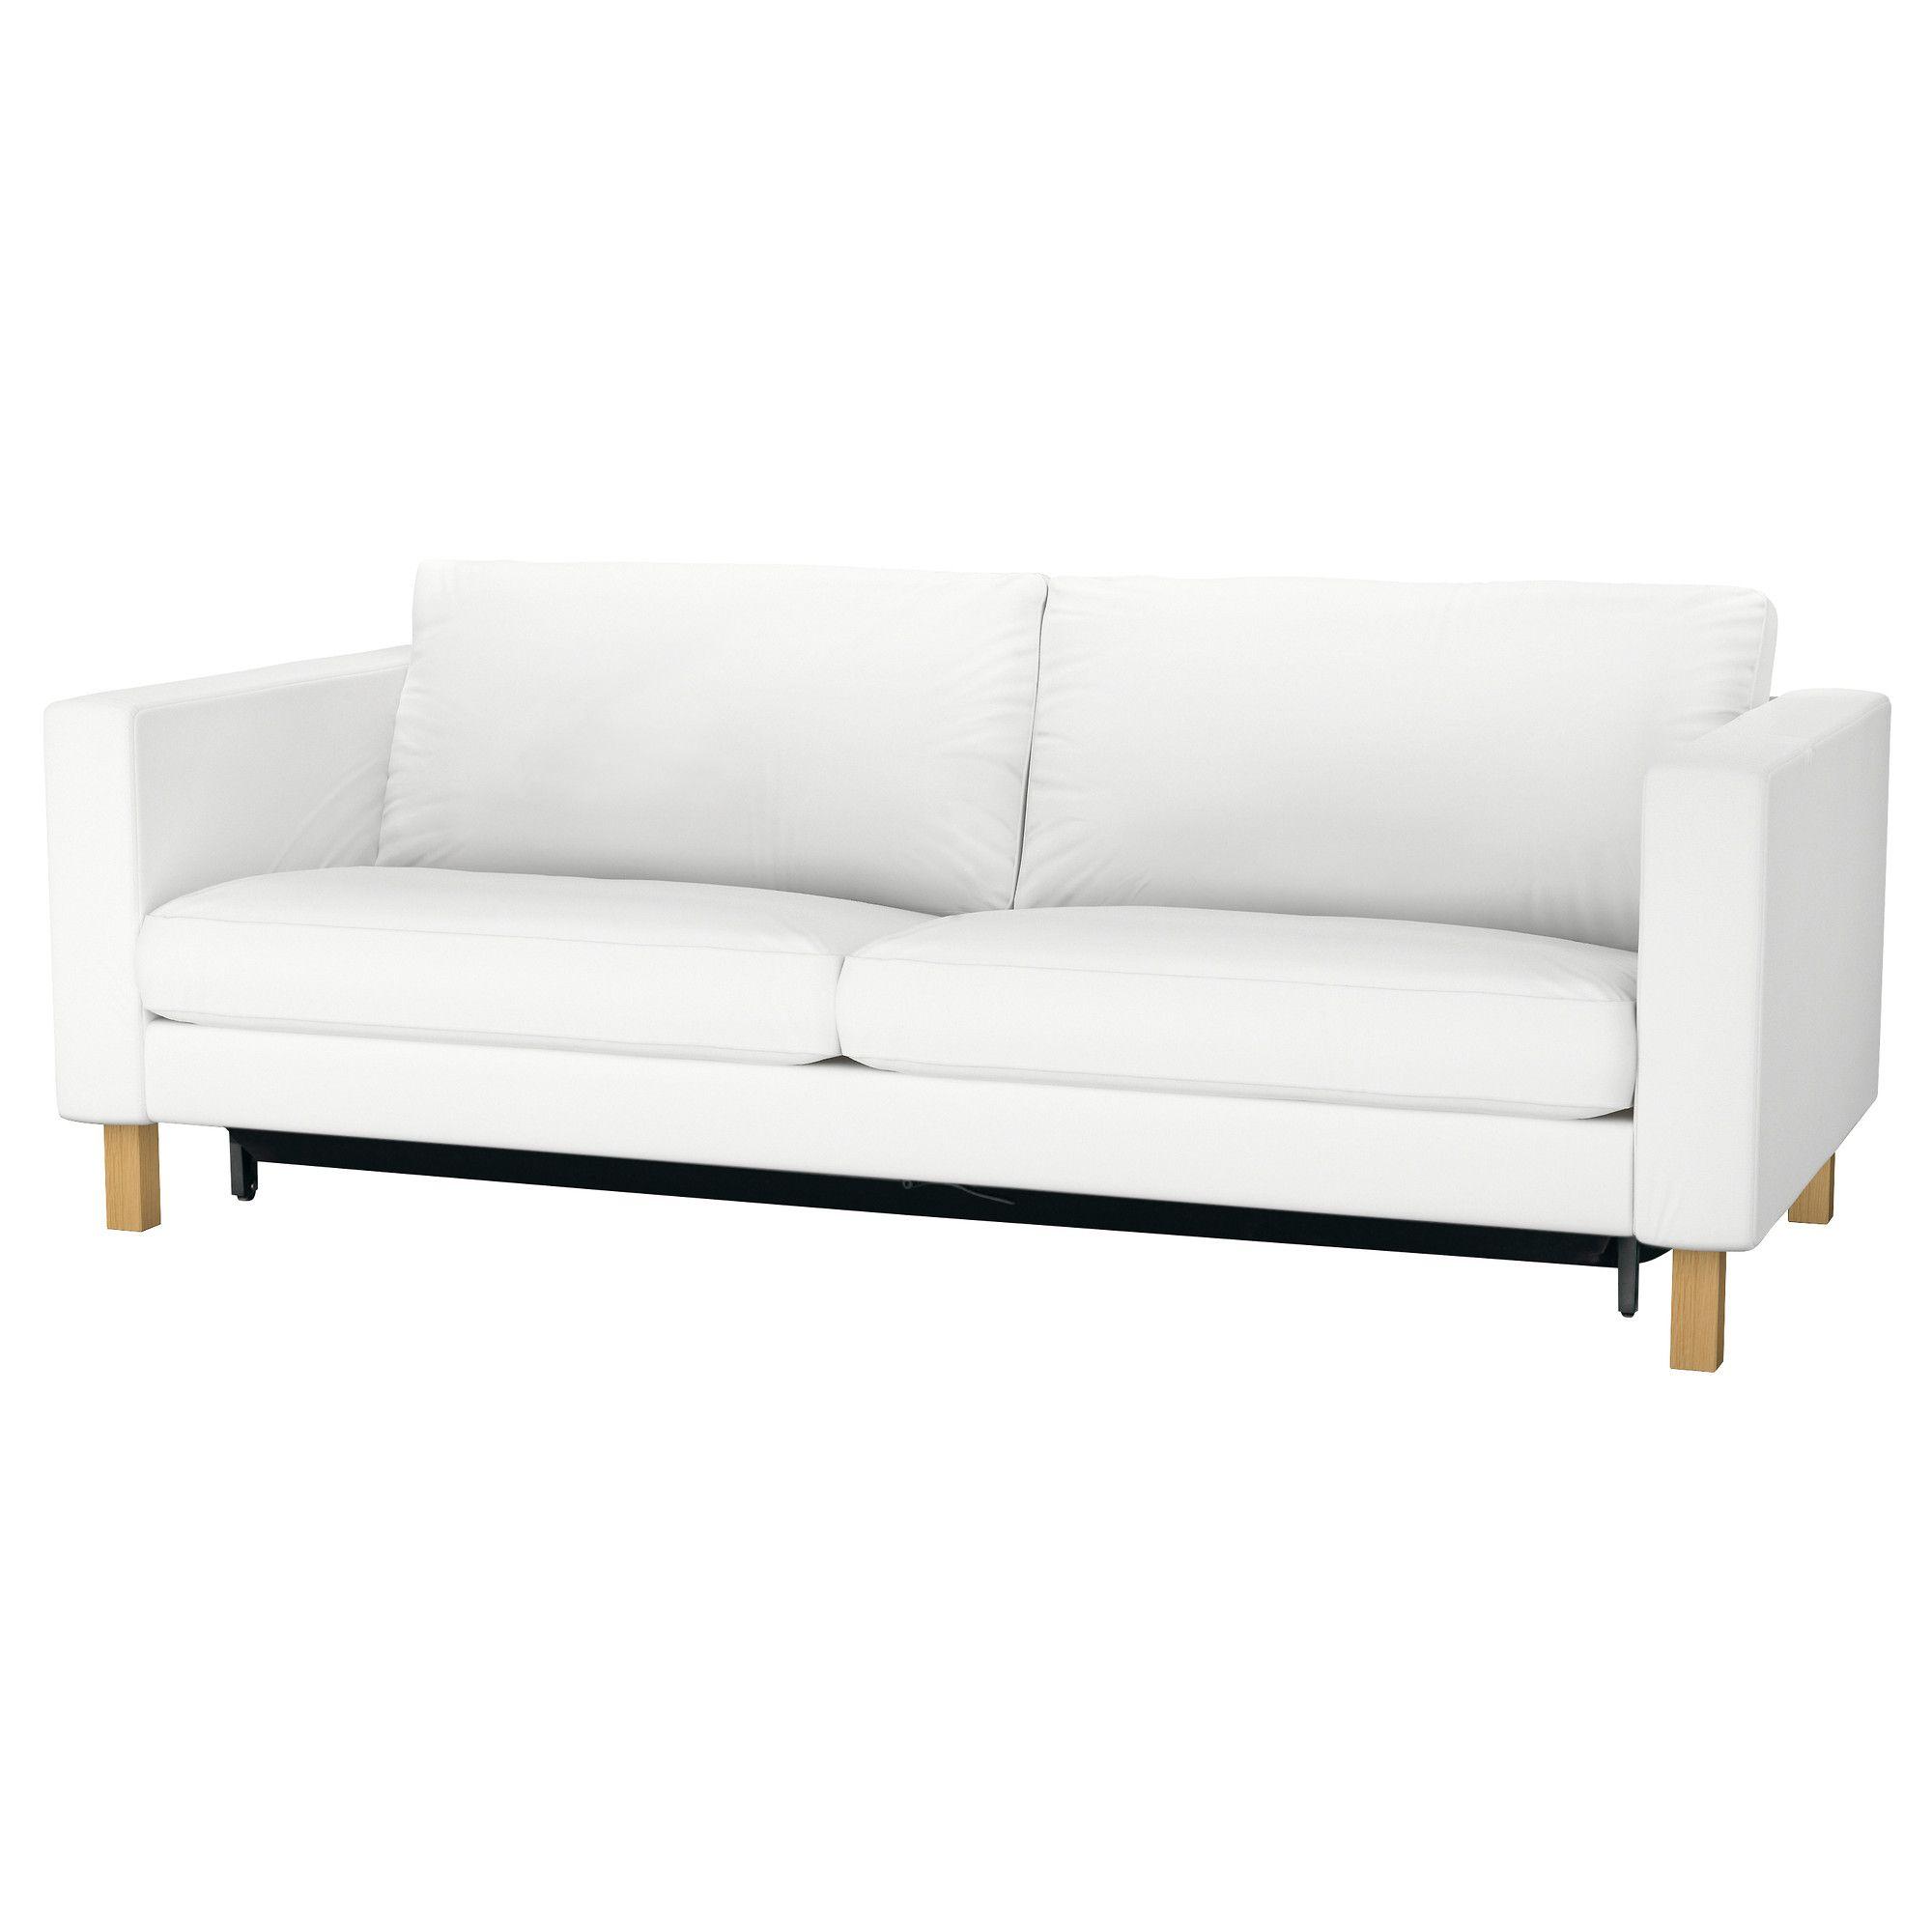 Ikea Australia Affordable Swedish Home Furniture Karlstad Sofa Ikea Karlstad Sofa Ikea Sofa